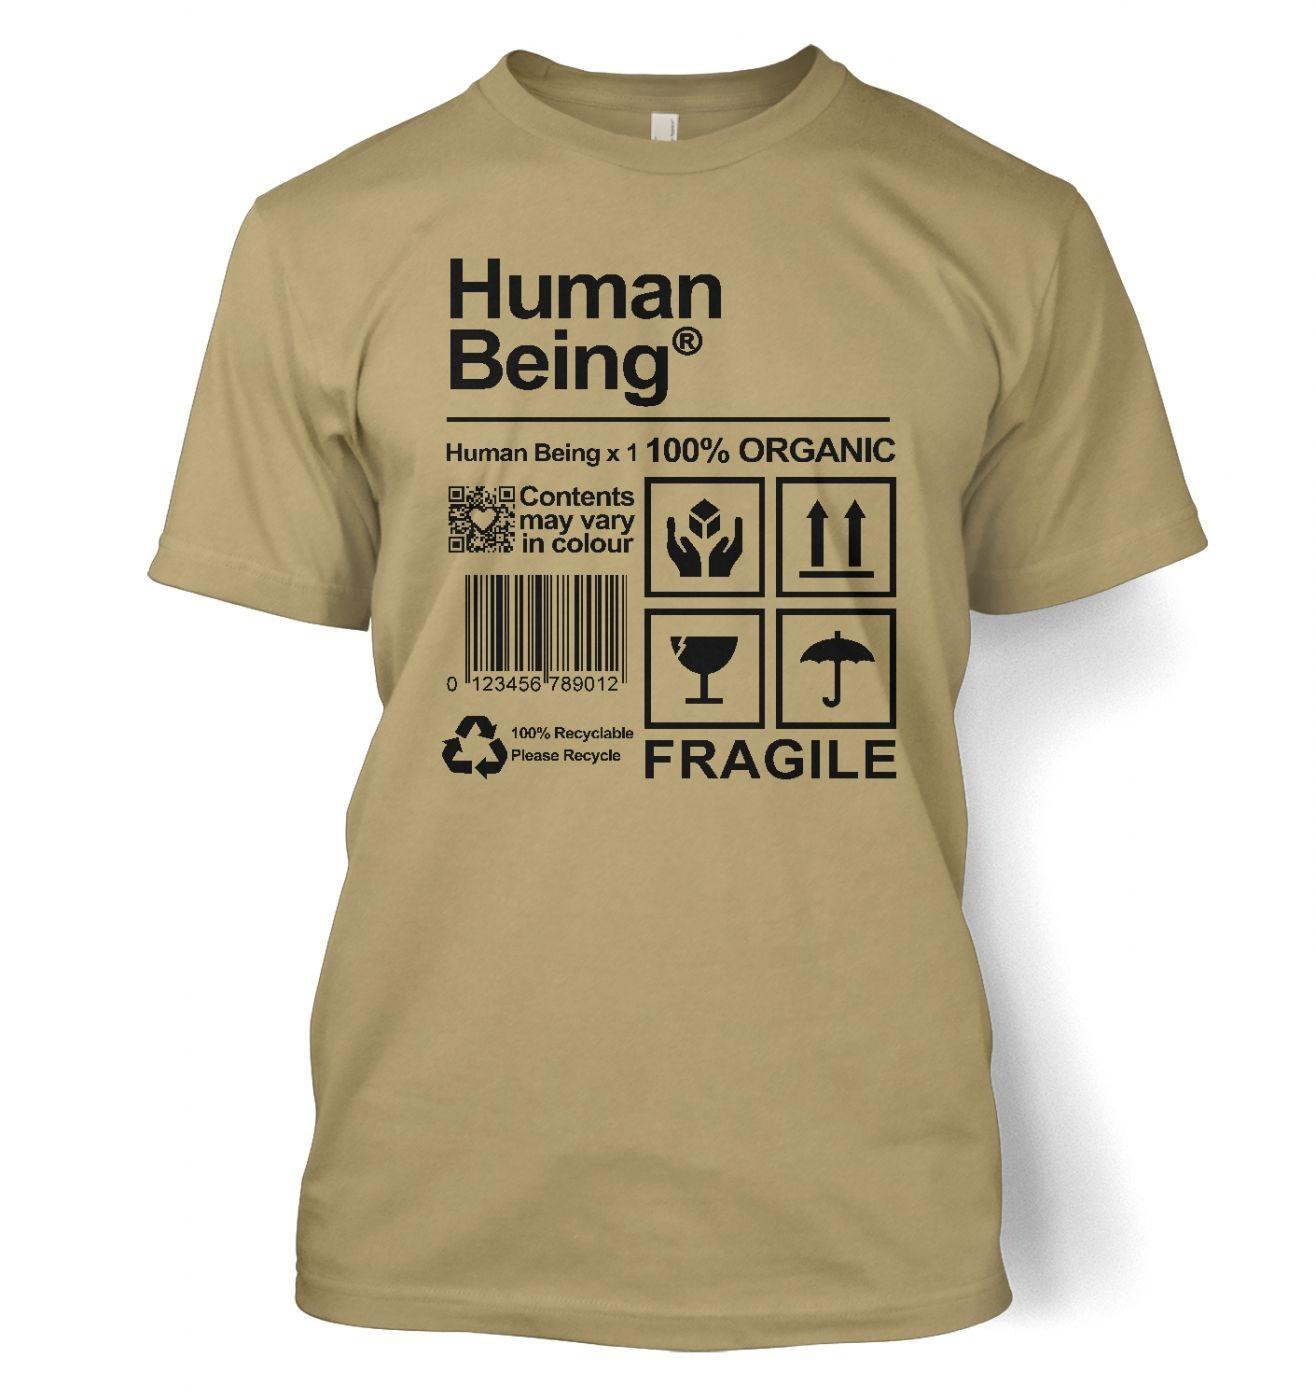 Human Being t-shirt